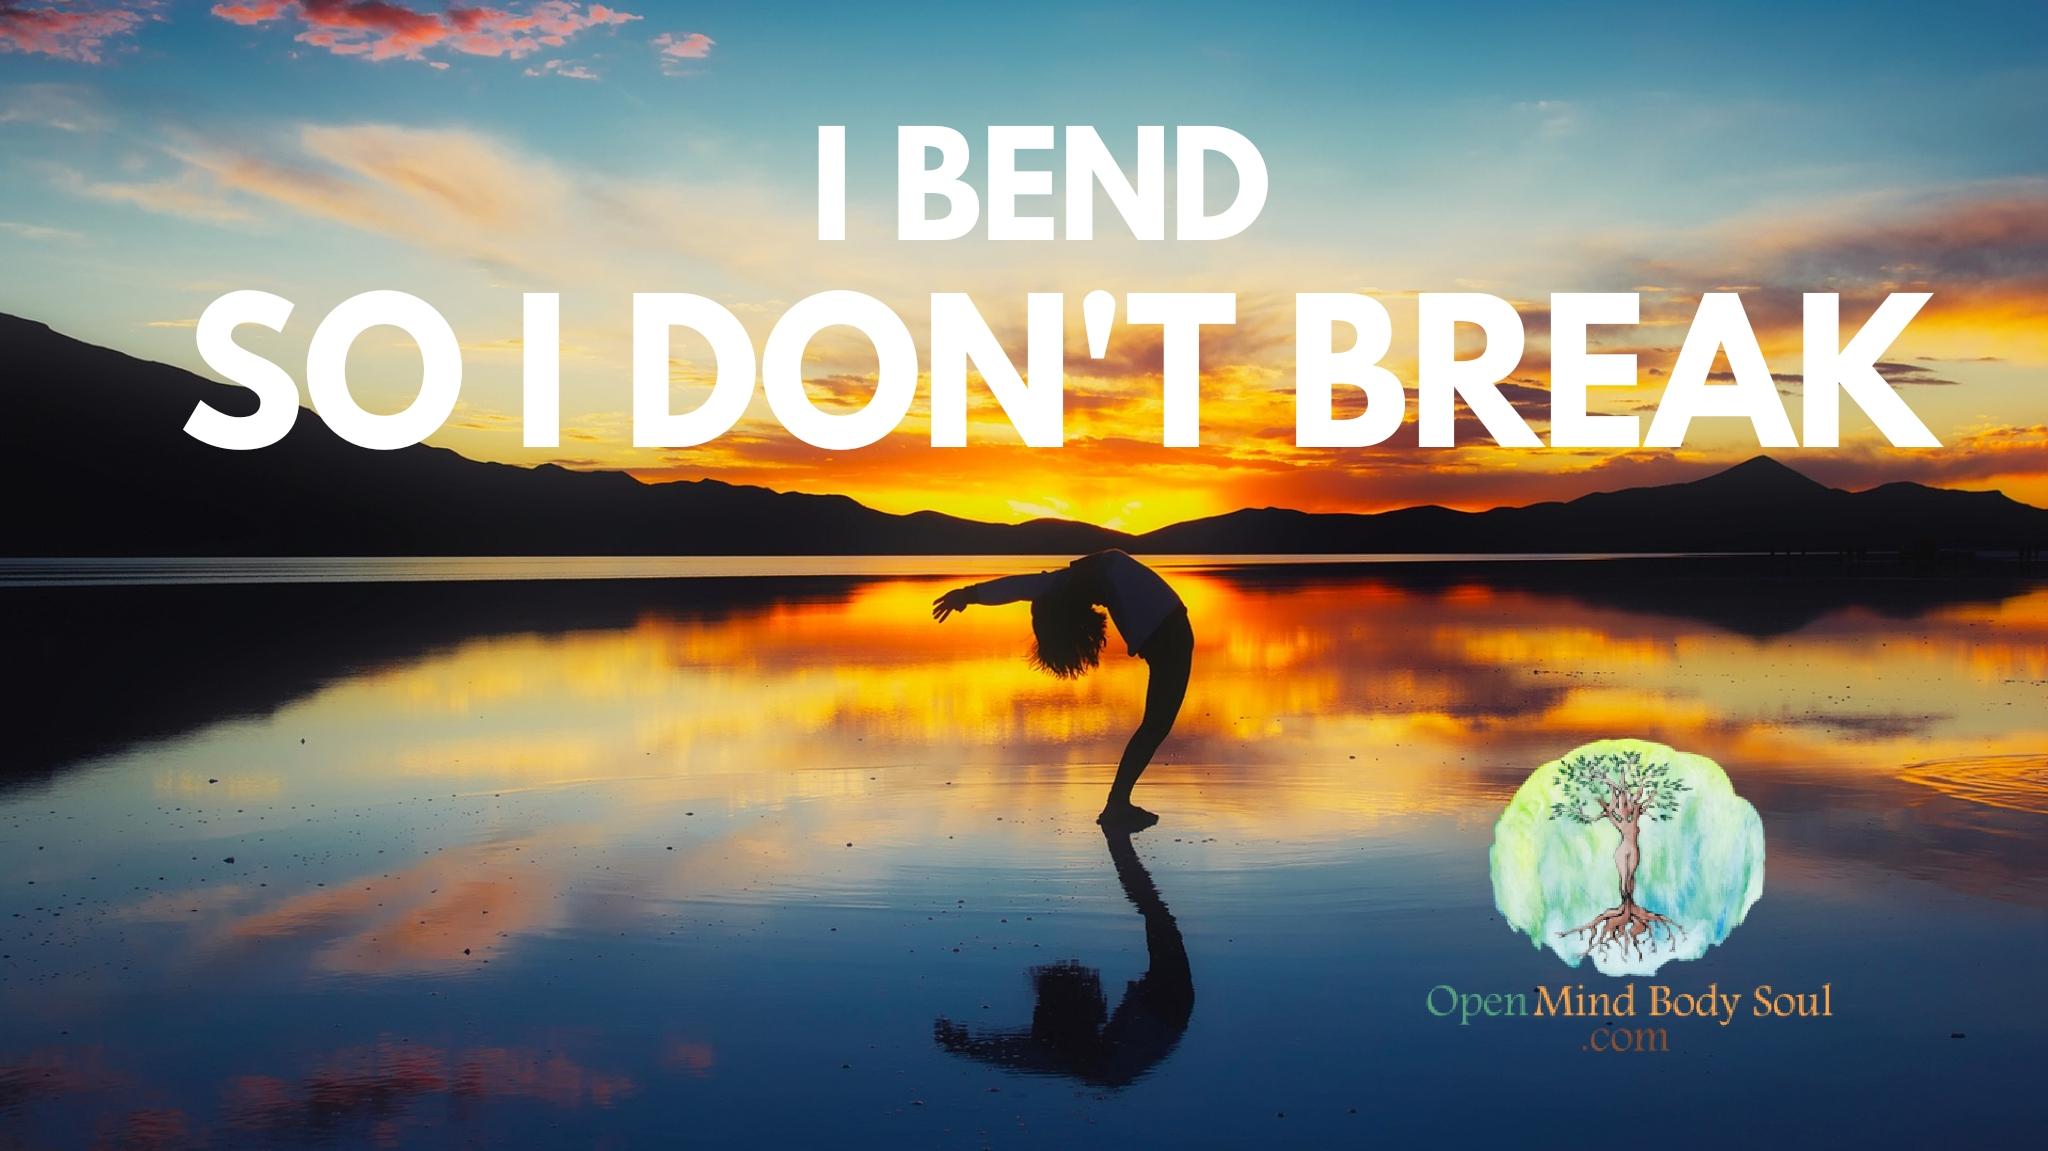 Yoga-quote-i-bend-so-dont-break